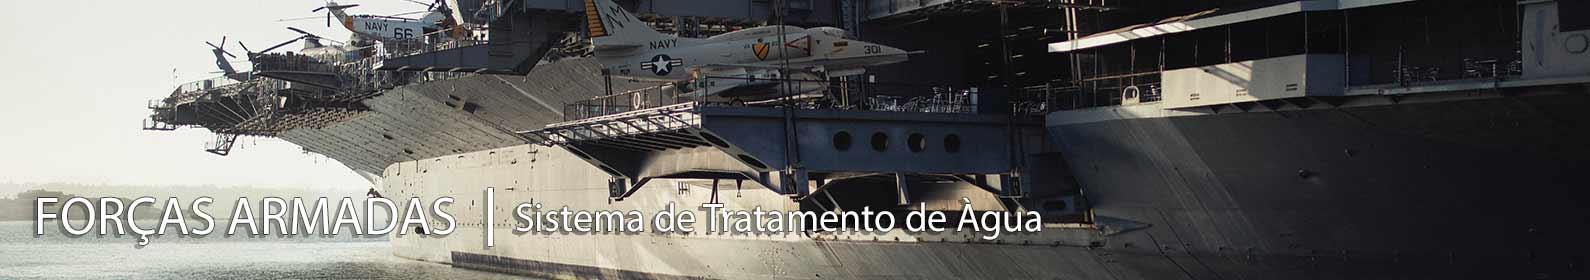 sistema-de-tratamento-de-gua-forcas-armadas.jpg